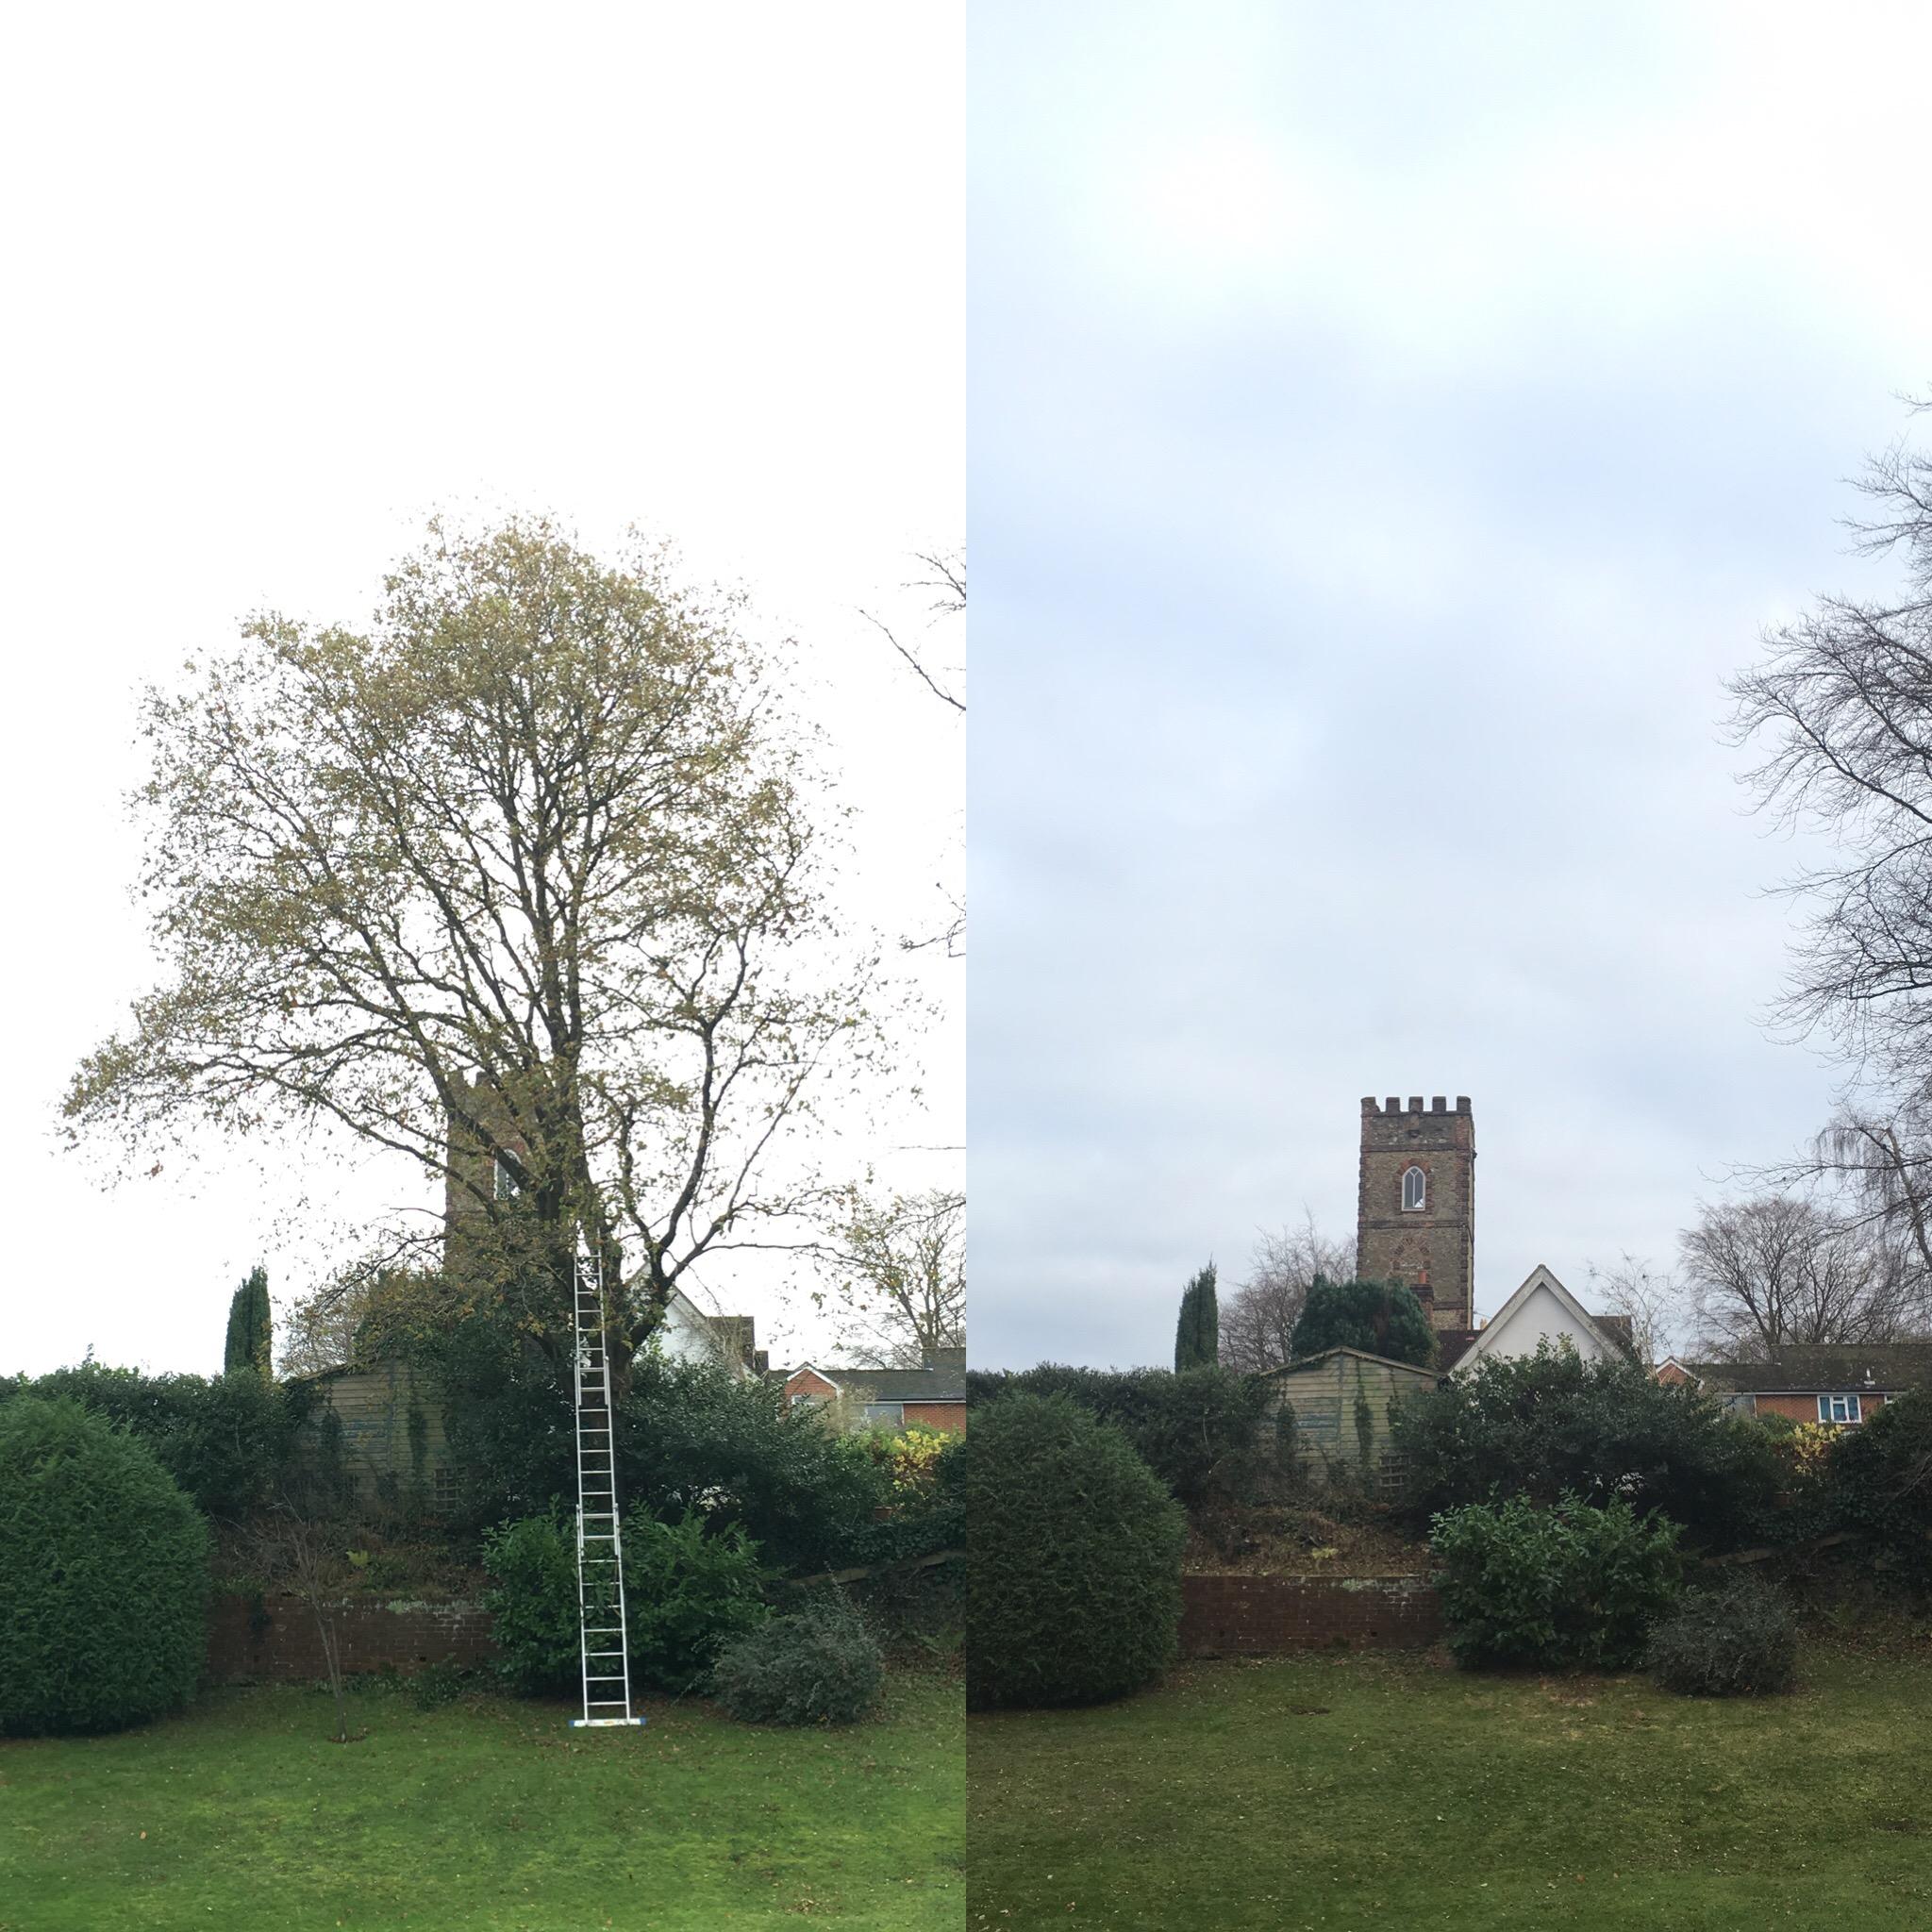 tree-dismantel-felling6.jpg